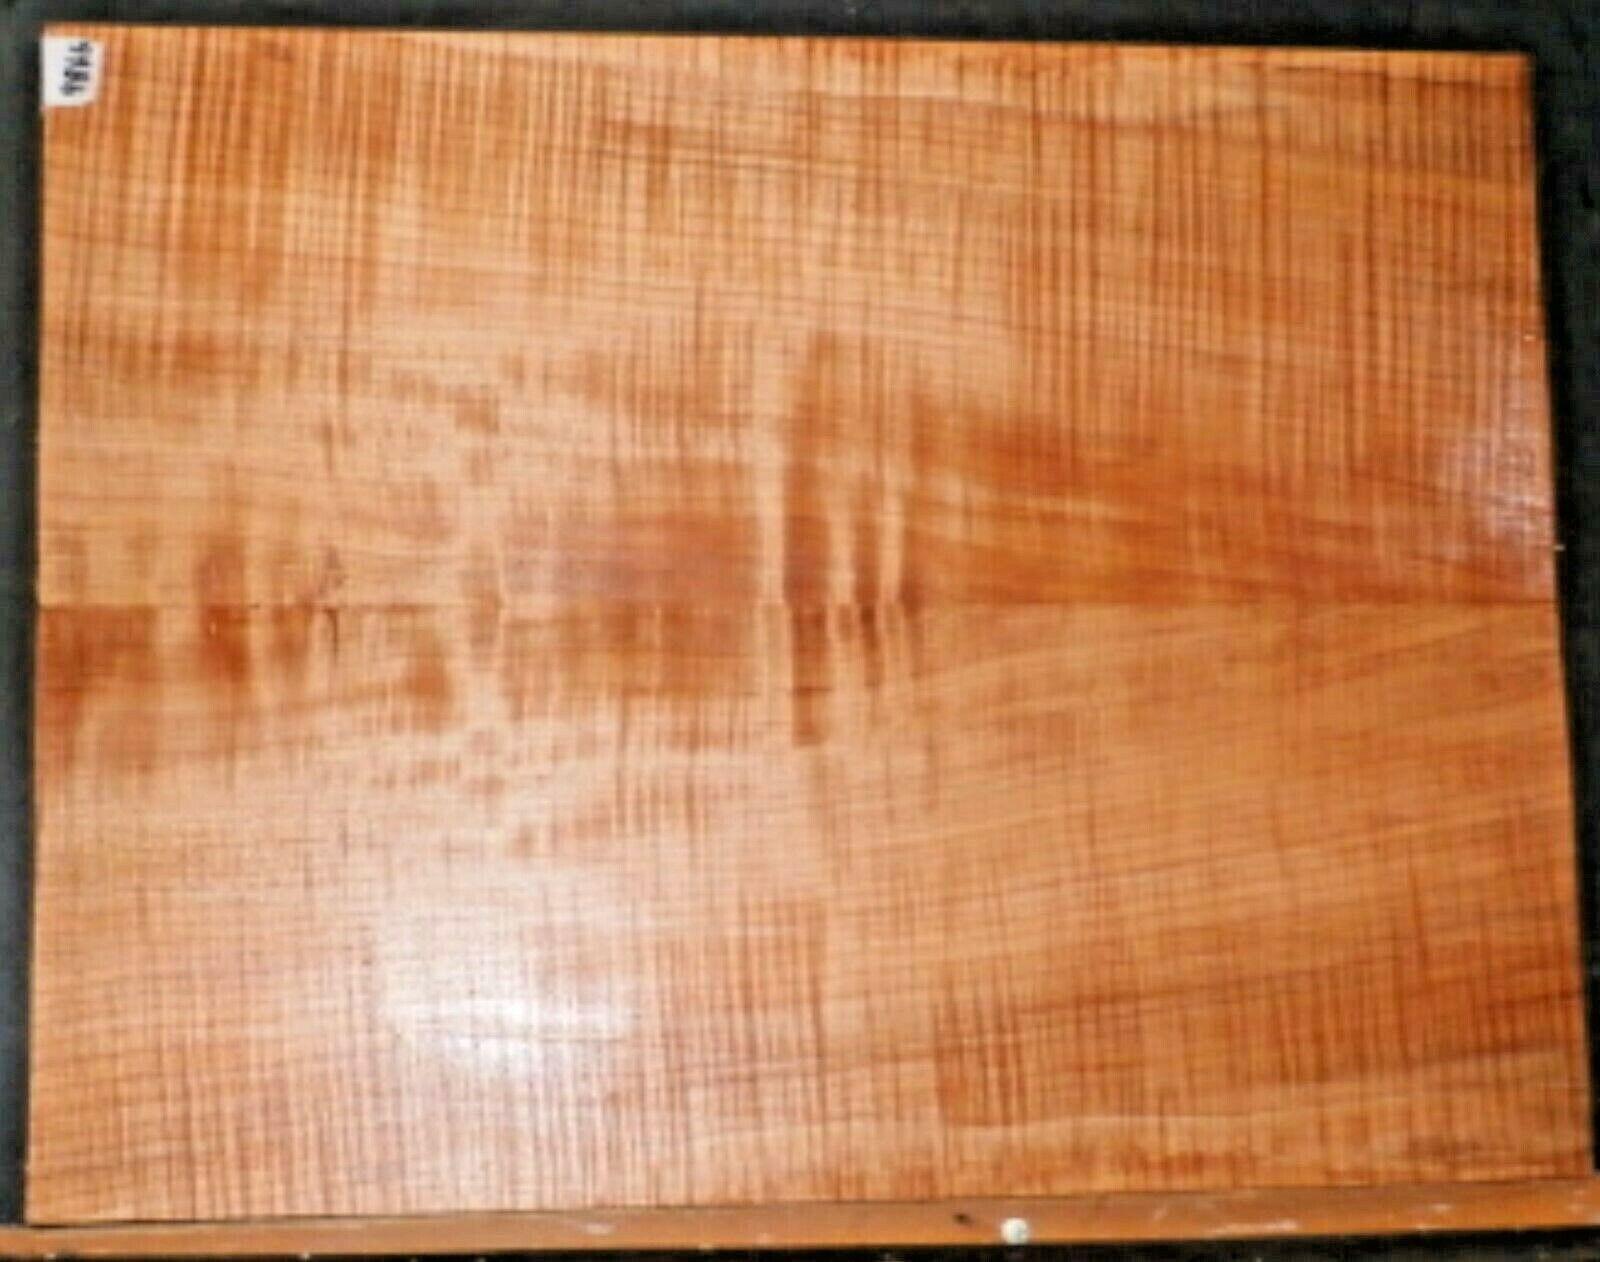 Flamme Curly Ahorn Holz 9866 Gitarrenbauer Solid Körper Gitarre Oberteil Set 24x